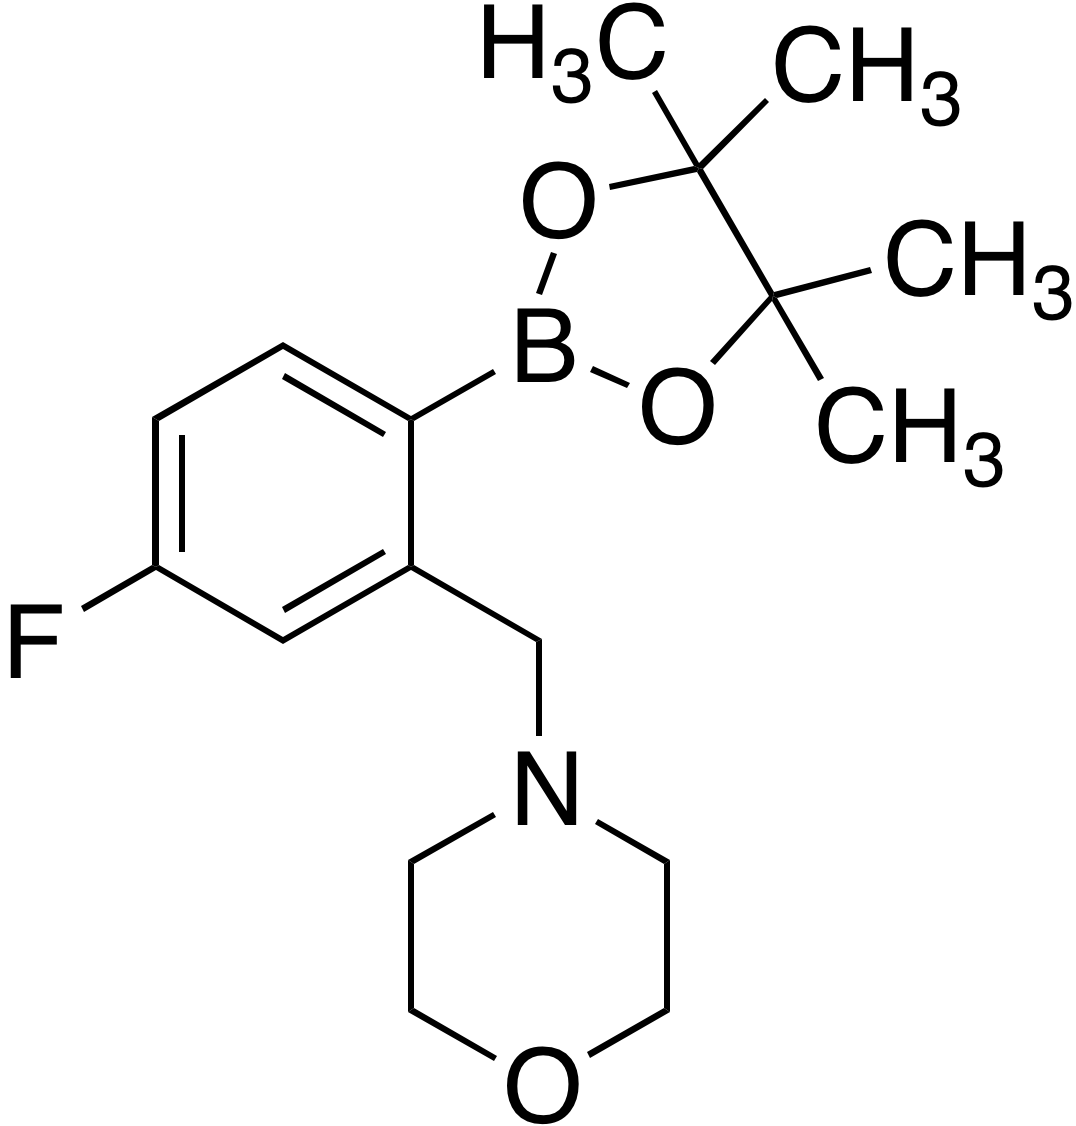 4-Fluoro-2-(4-morpholinylmethyl)benzeneboronic acid pinacol ester